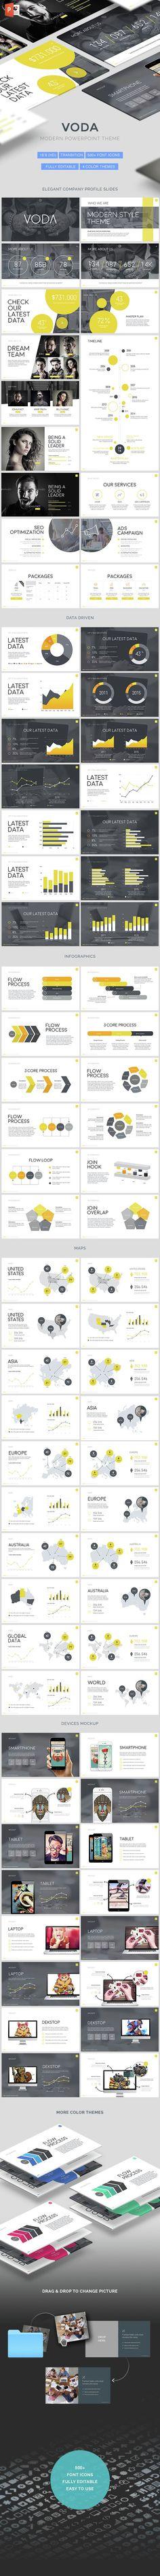 Voda - Creative Powerpoint Template (PowerPoint Templates)